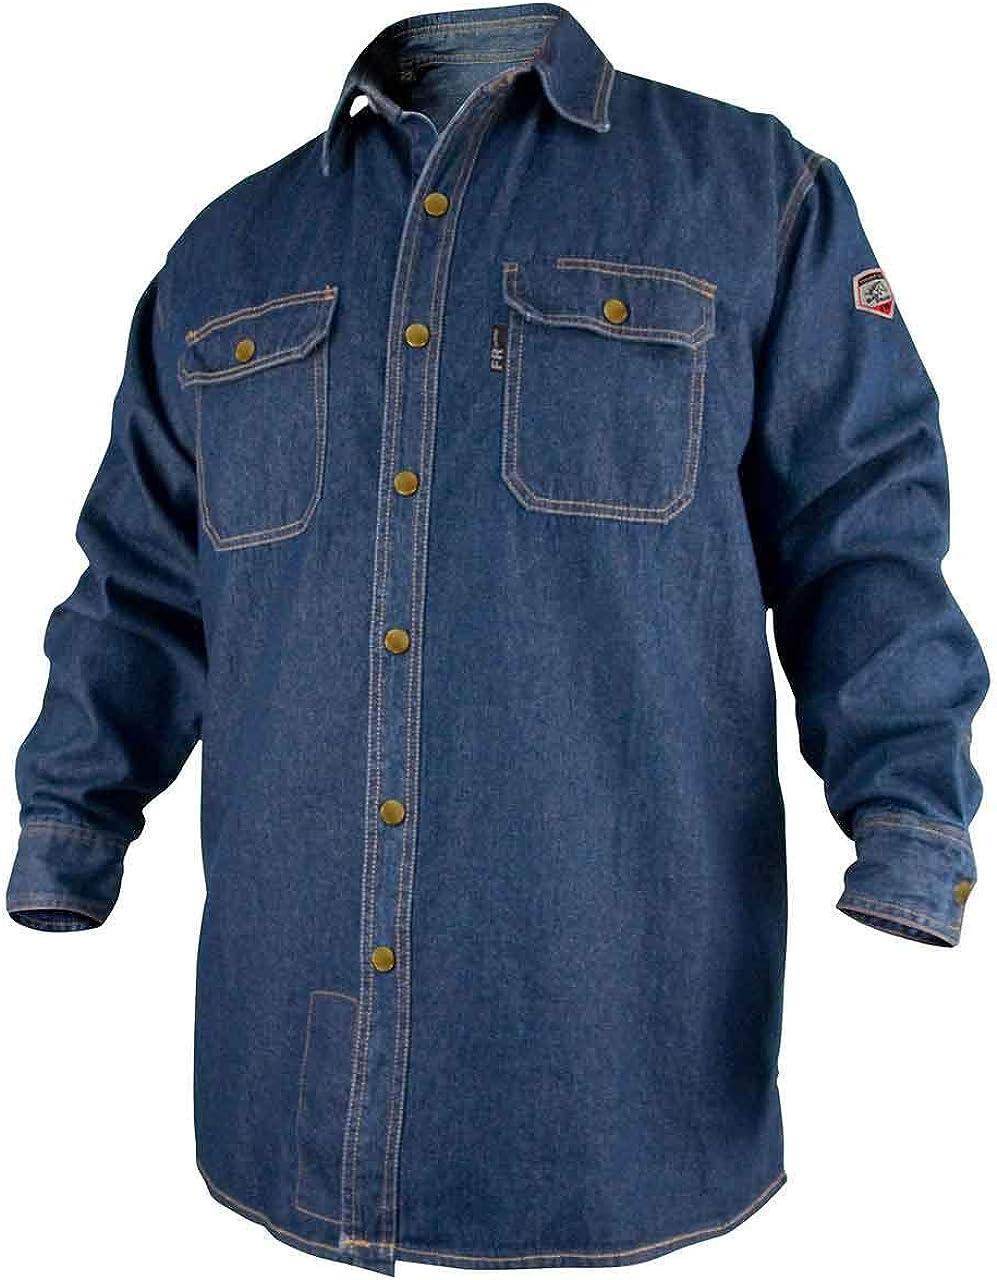 Revco FS8-DNM-XXL XX-Large Denim Fire Resistant Long Sleeve Cotton Welding Shirt